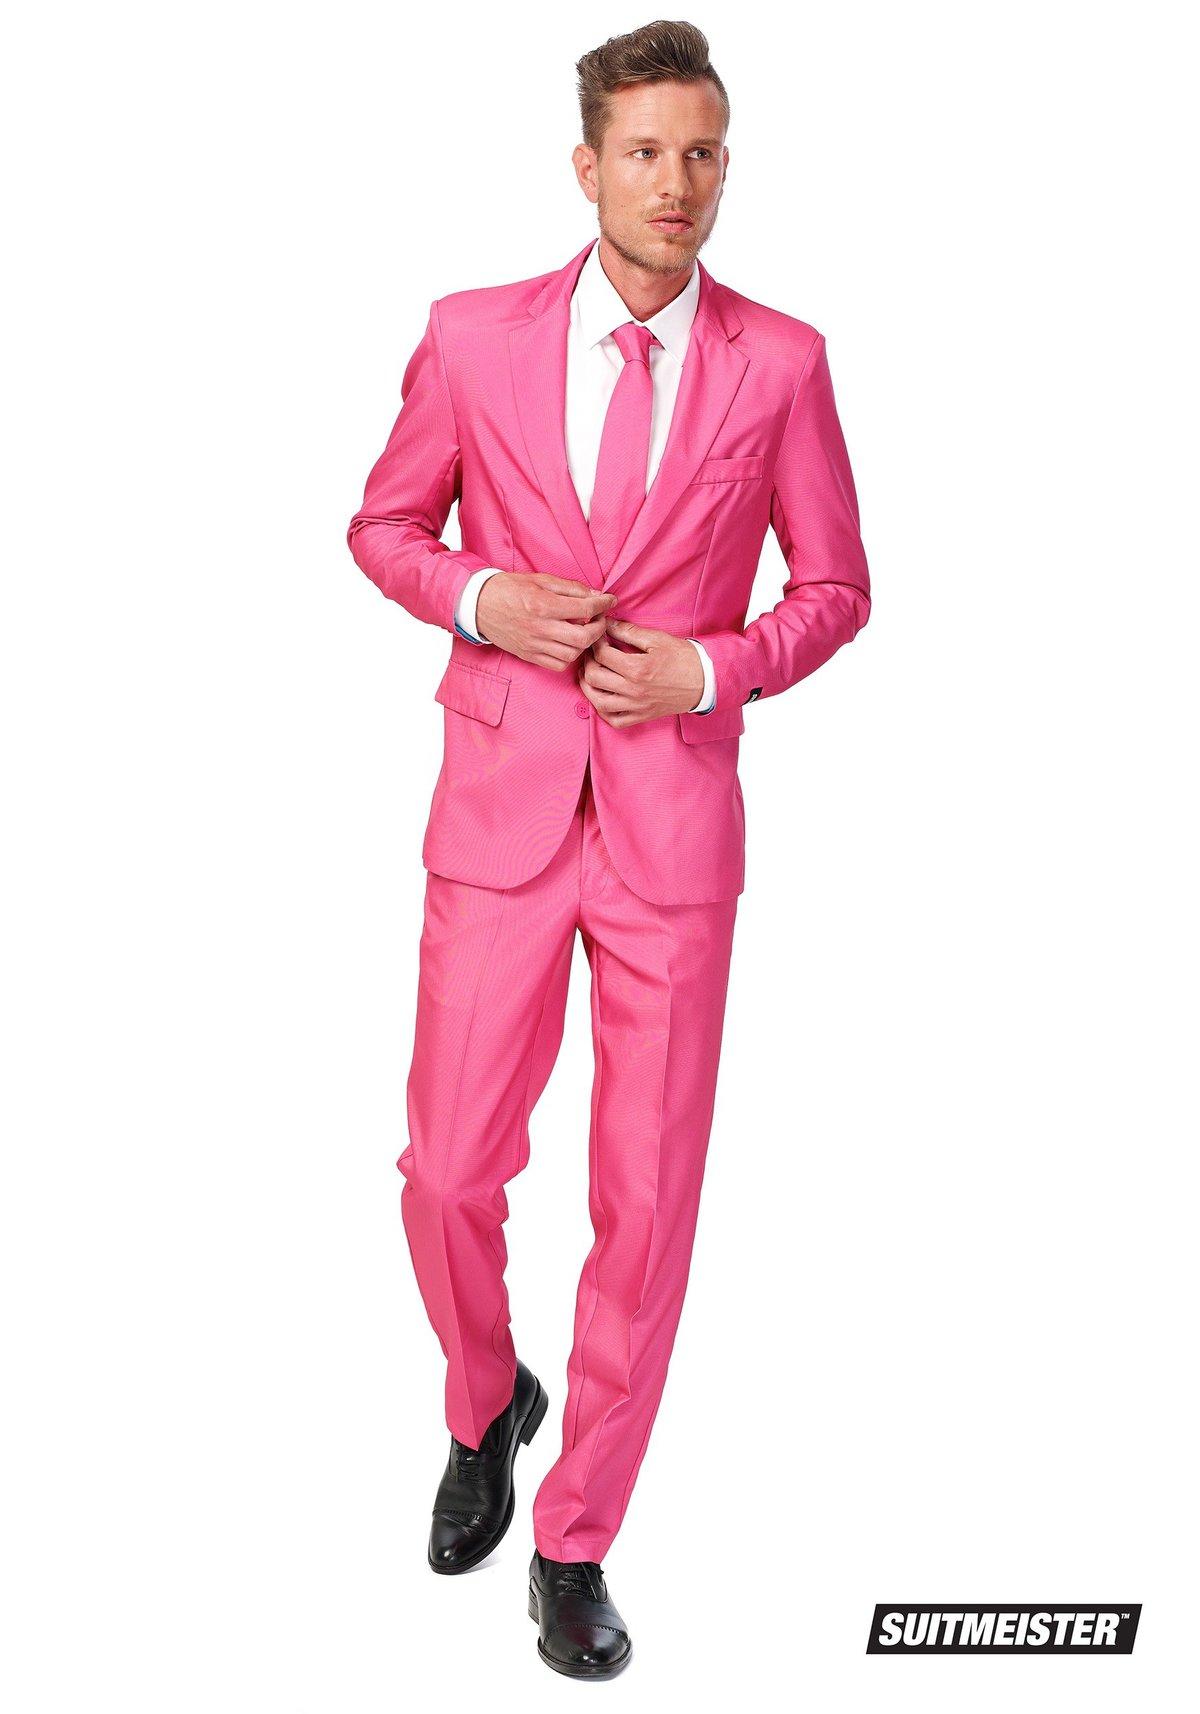 пацан в розовом костюме каждого предприятия своя